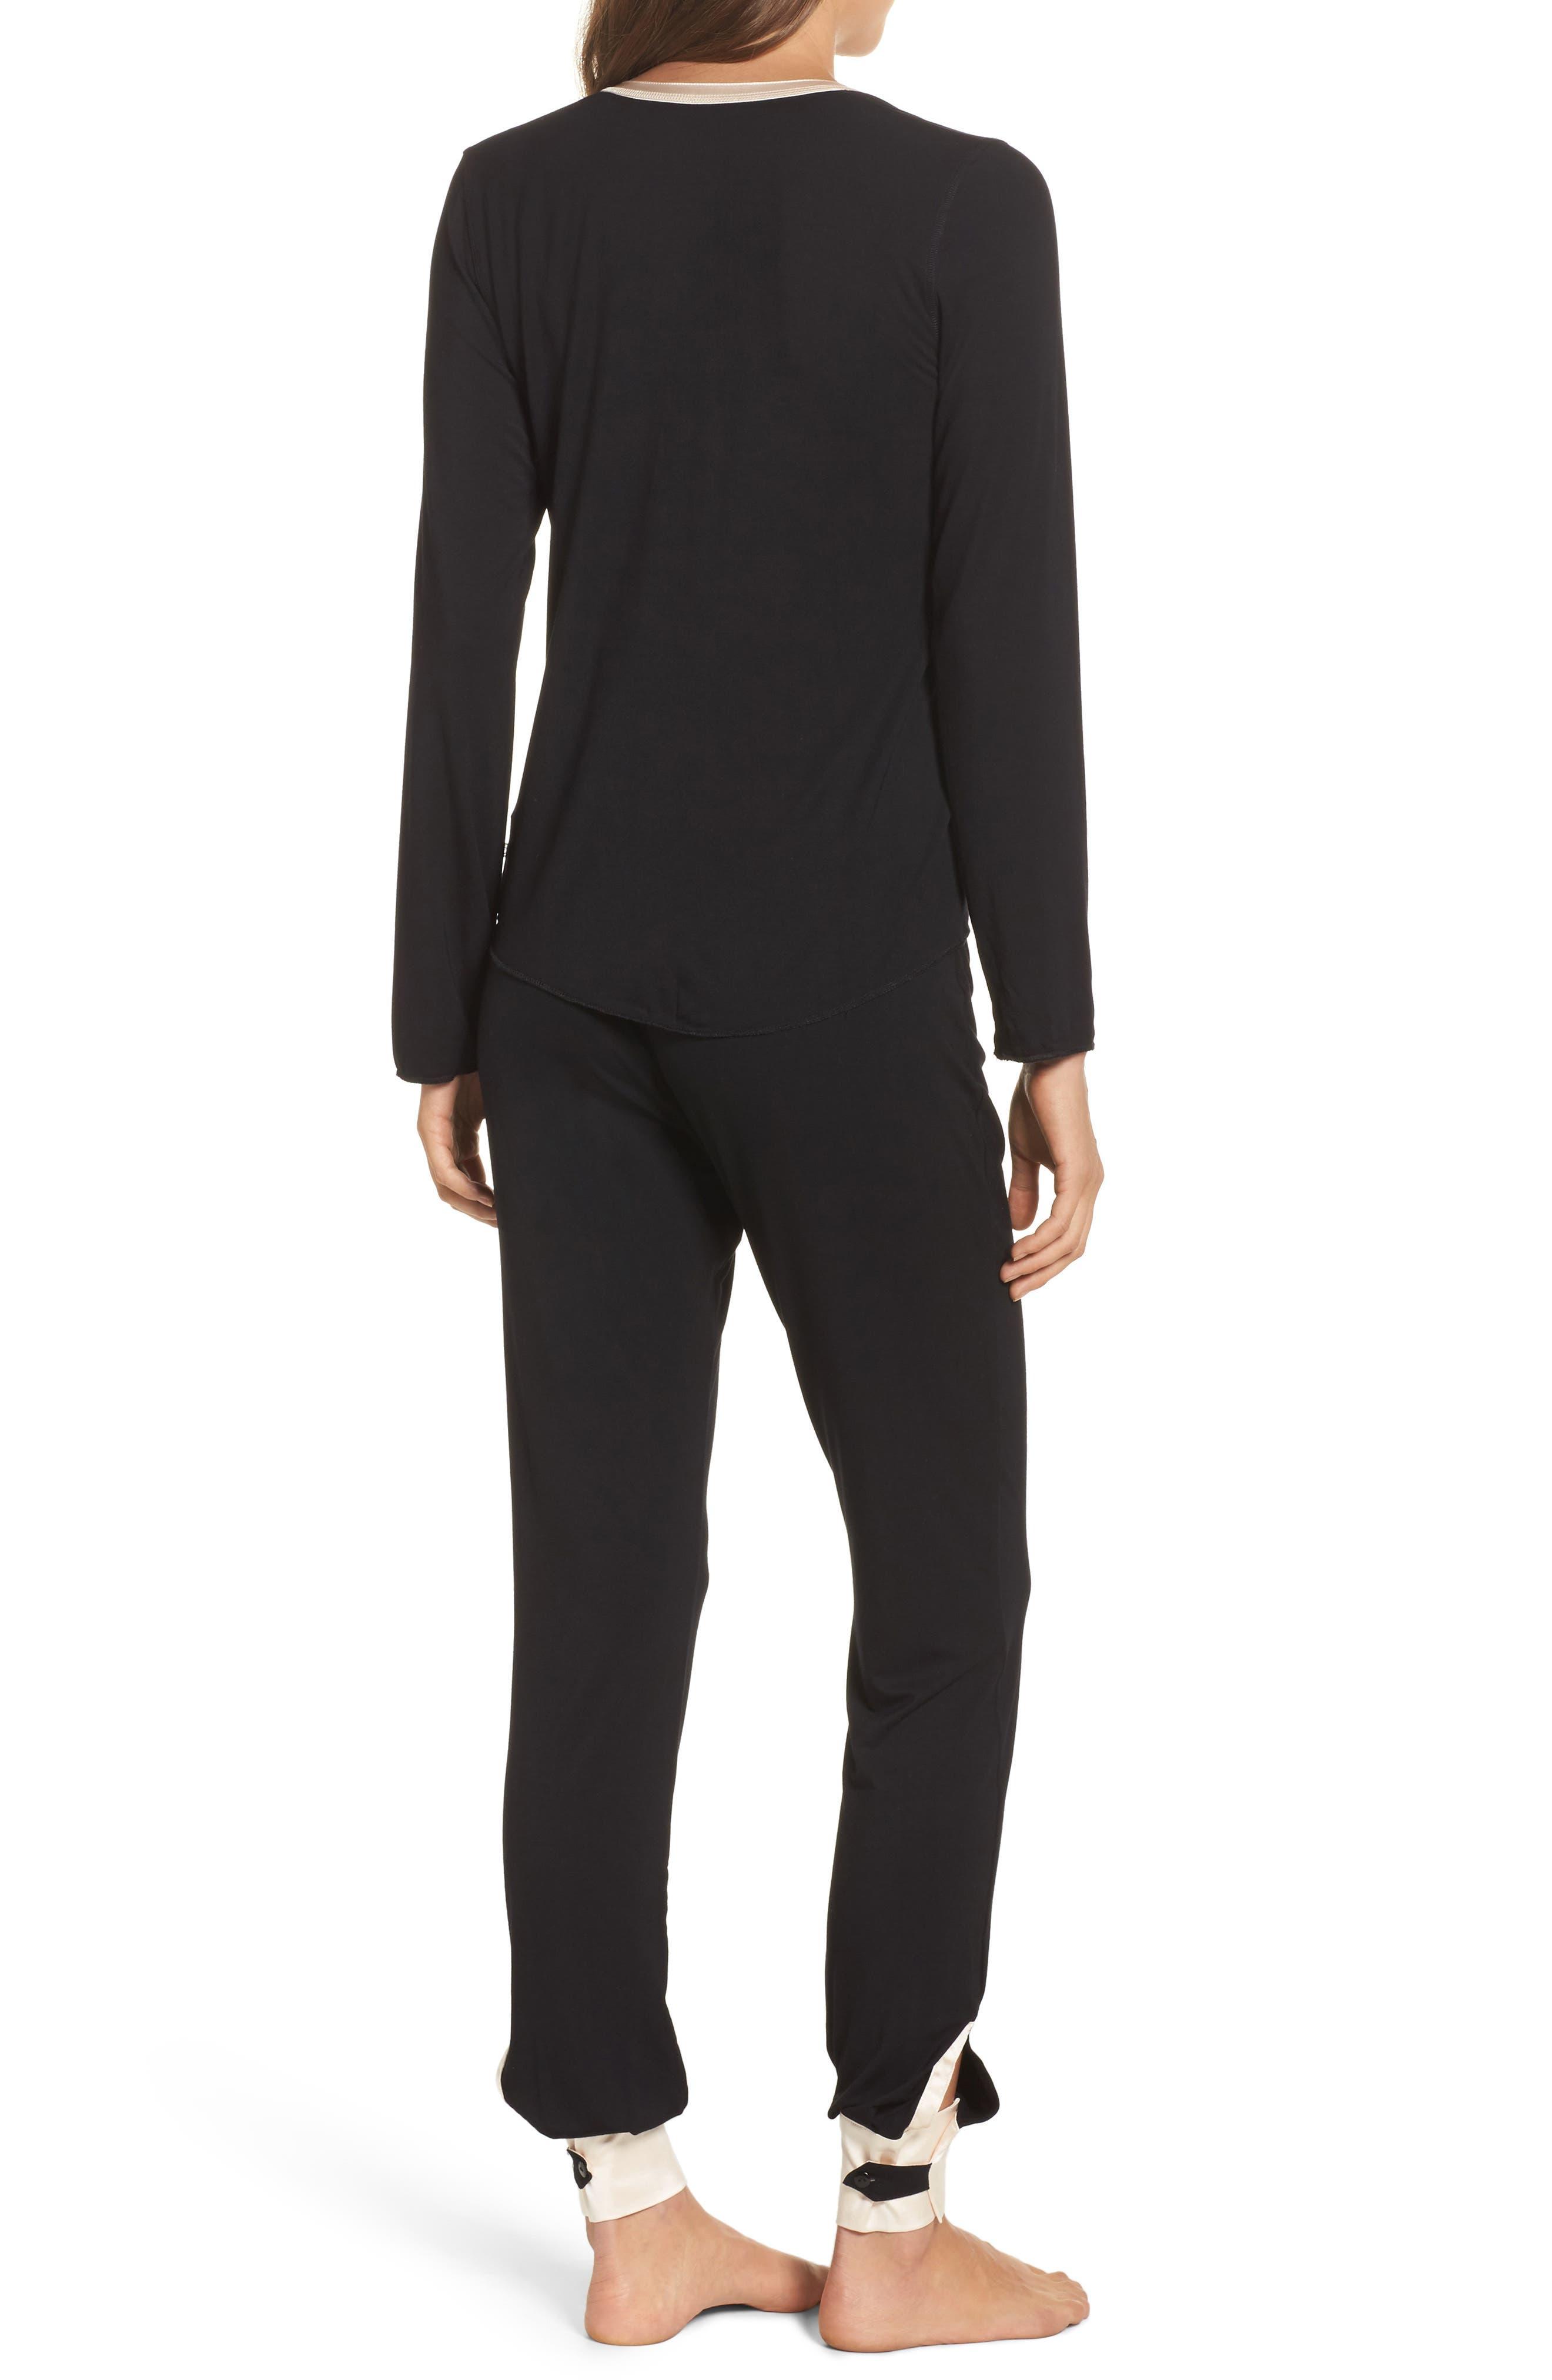 Cara Modal Knit Long Pajamas,                             Alternate thumbnail 2, color,                             Noir/ Vanilla